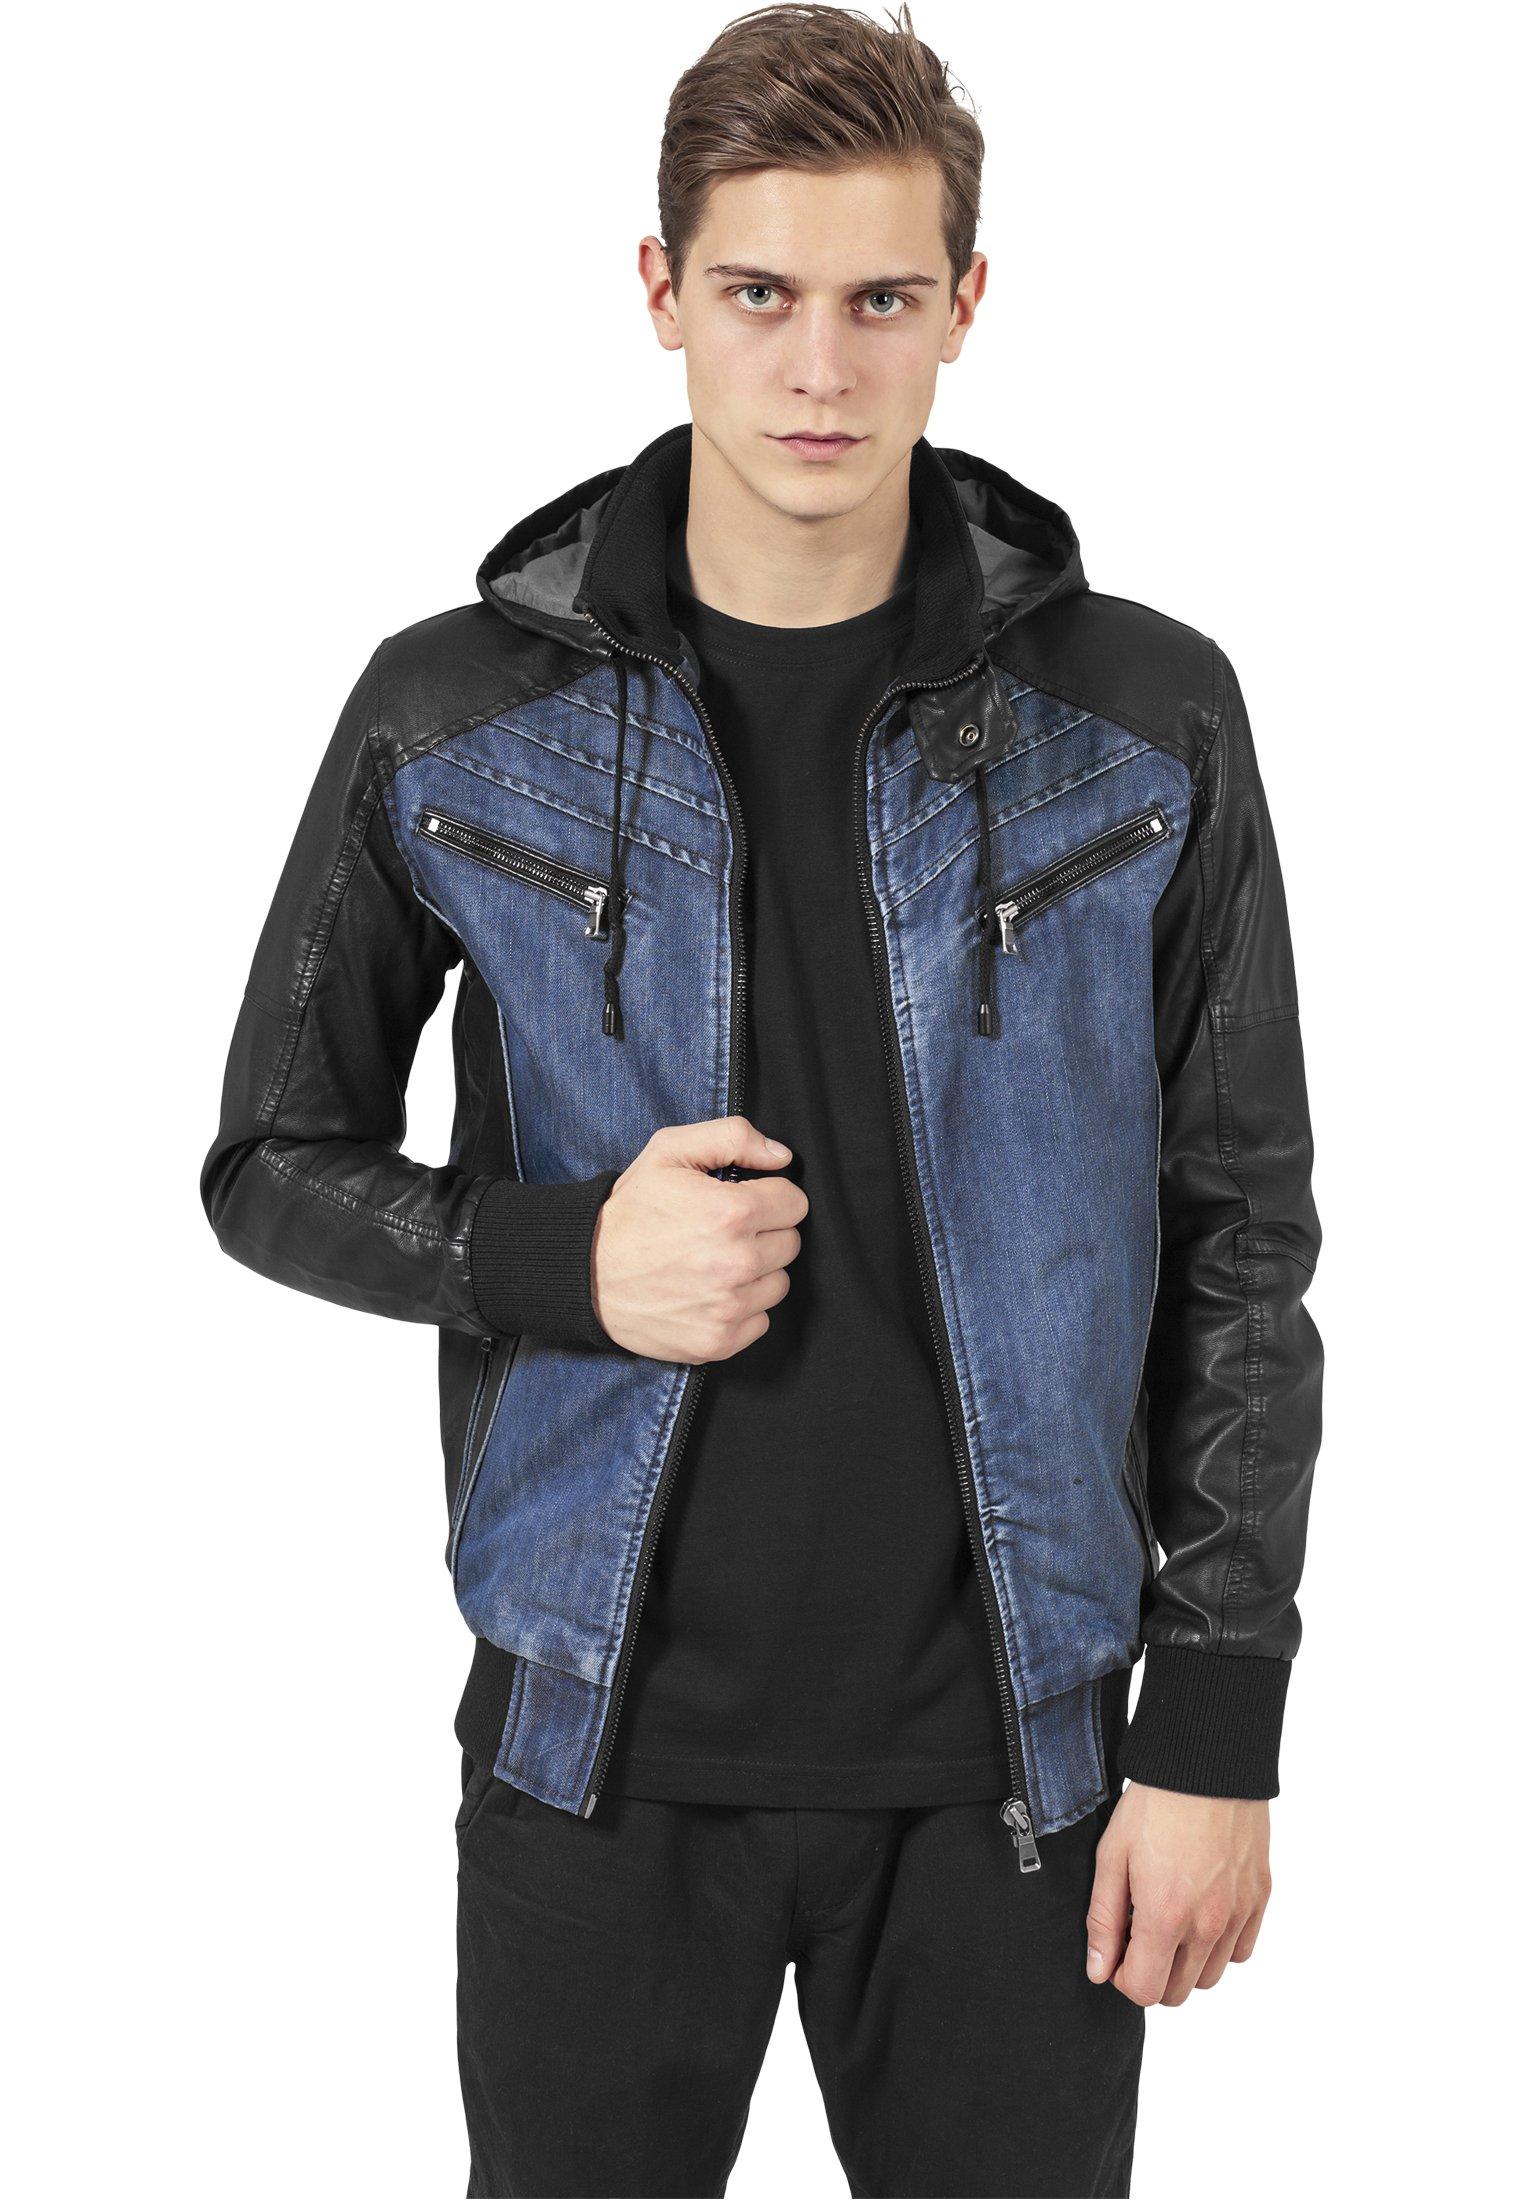 Urban Classics Mens Light Jacket TB675 Hooded Denim Leather Jacket Color: denim/black in Size: Small